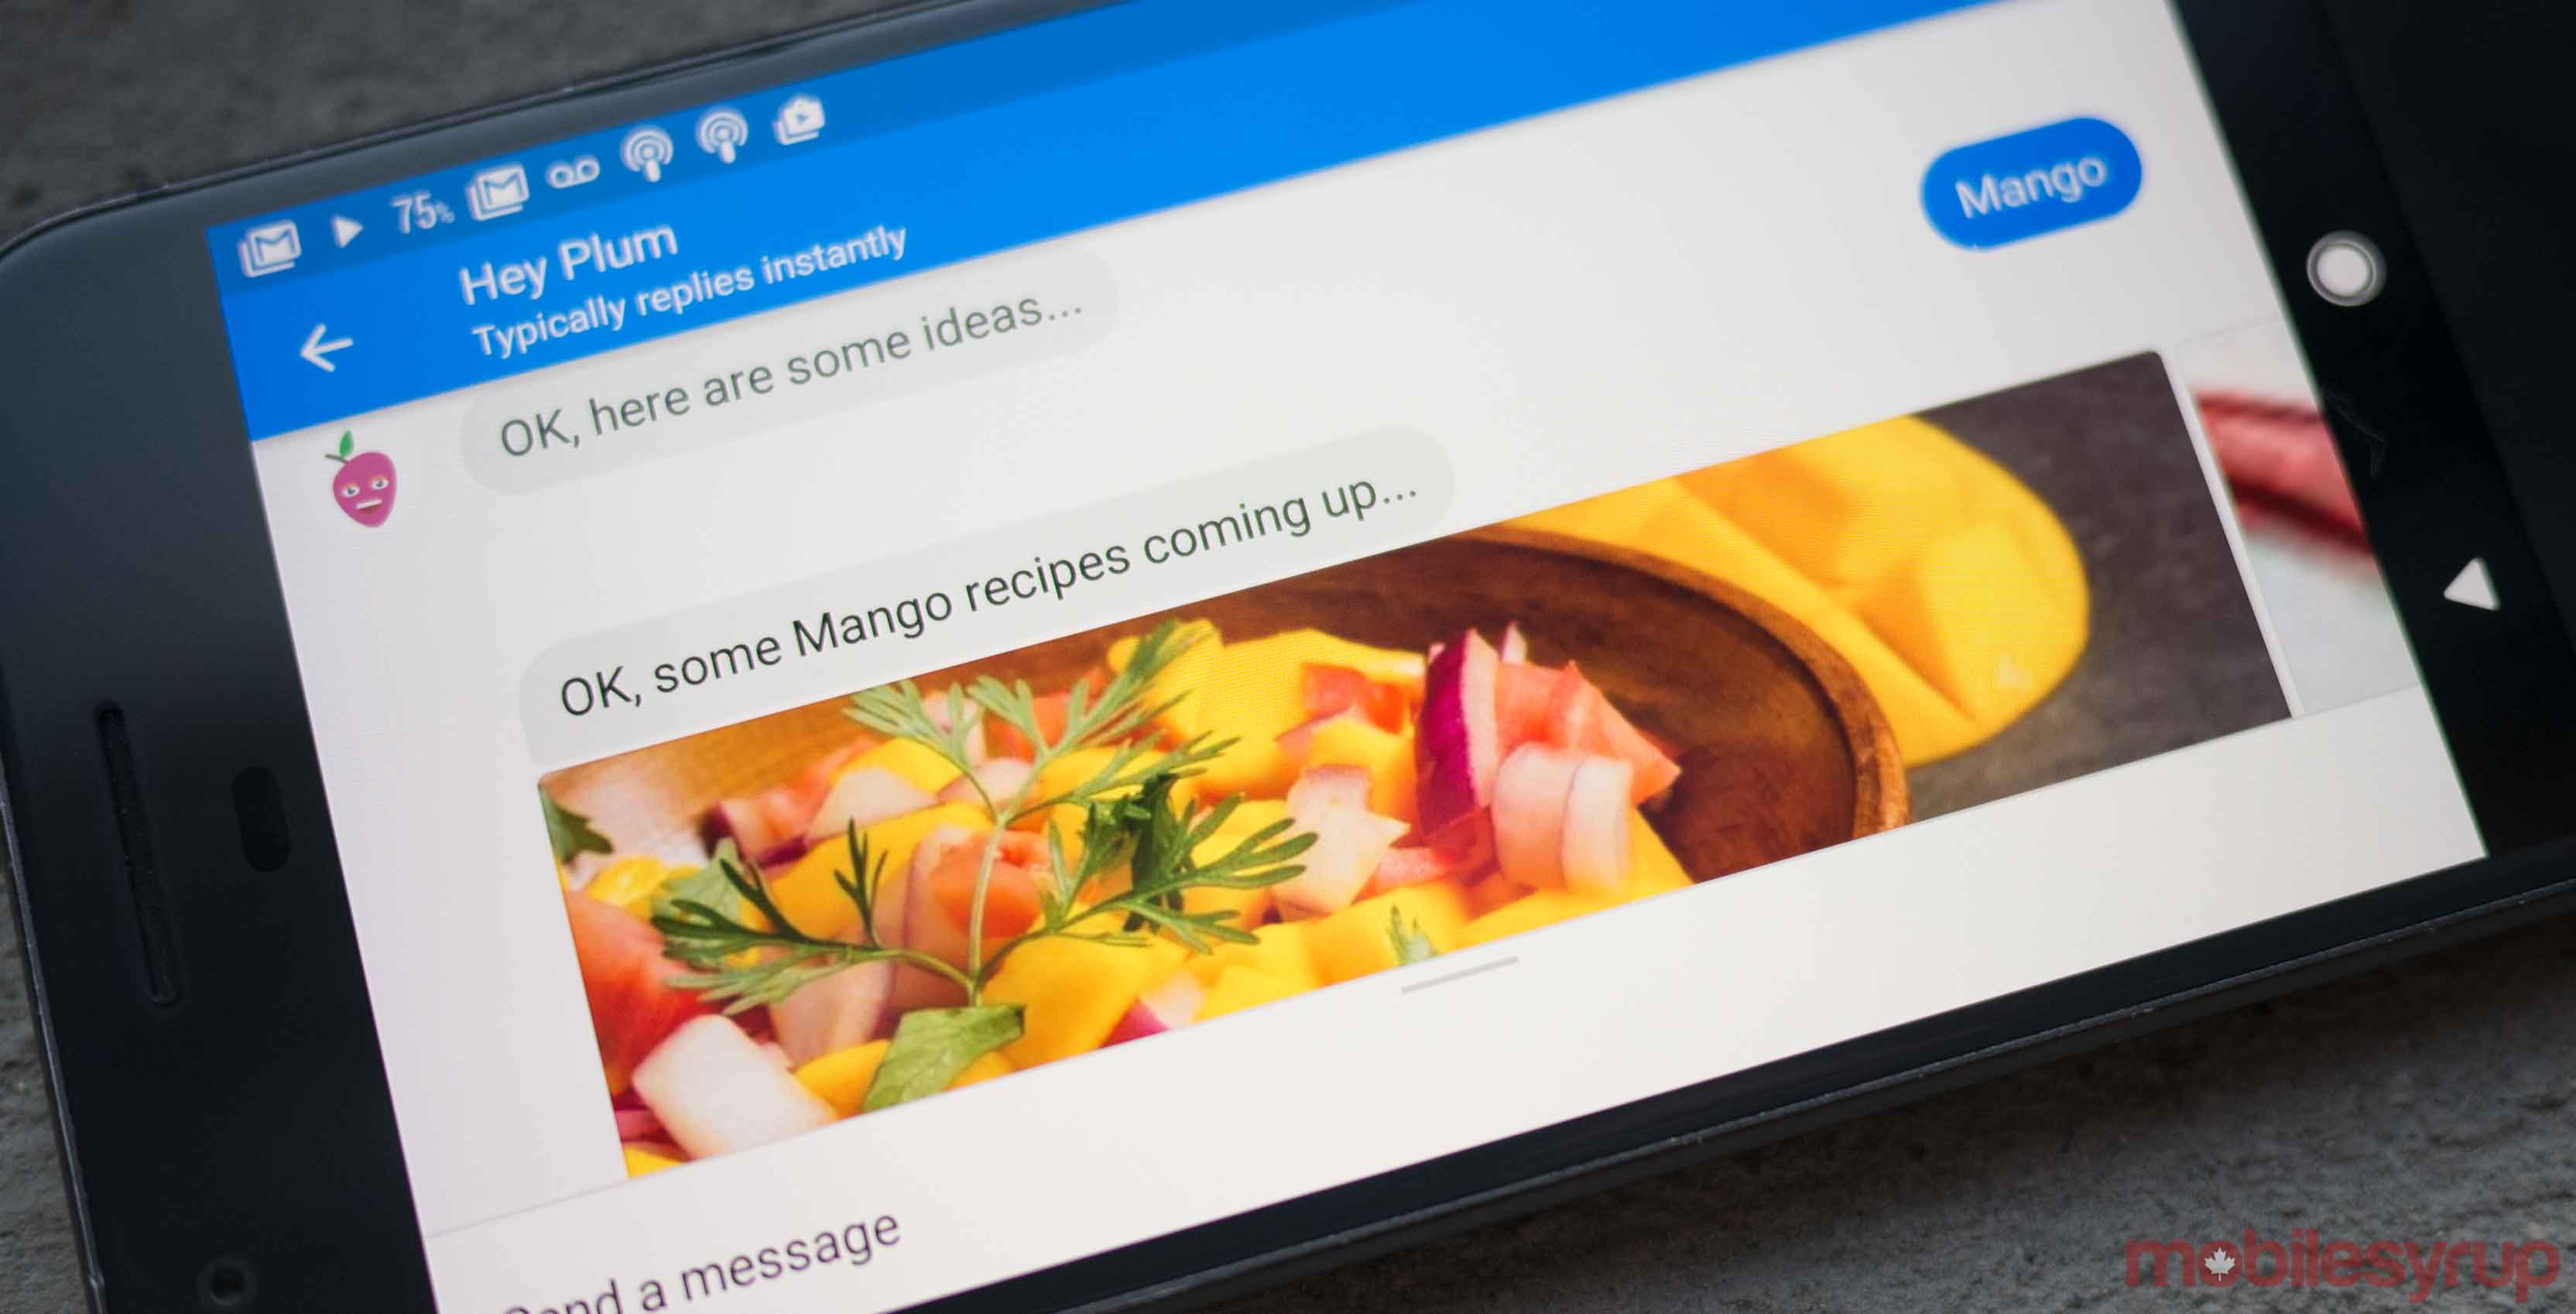 Photo of Plum app on a Google Pixel